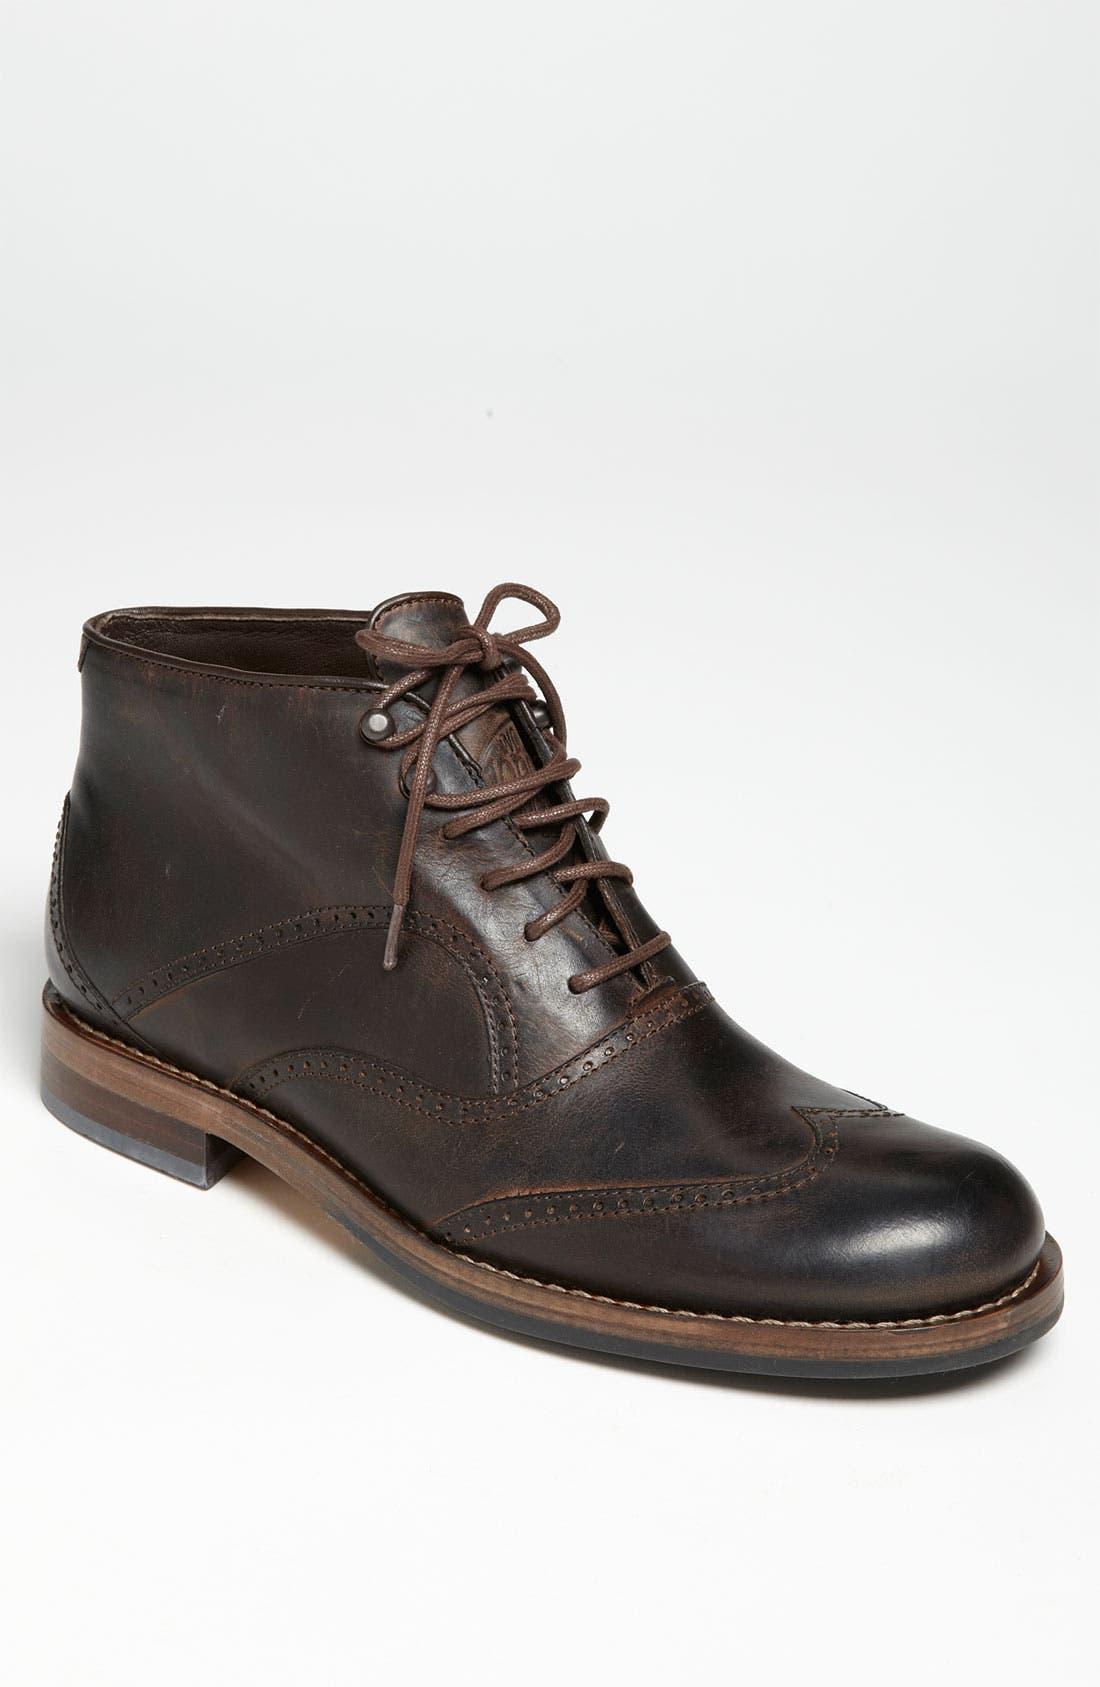 Main Image - Wolverine 'Wesley' Chukka Boot (Regular Retail Price: $294.00)